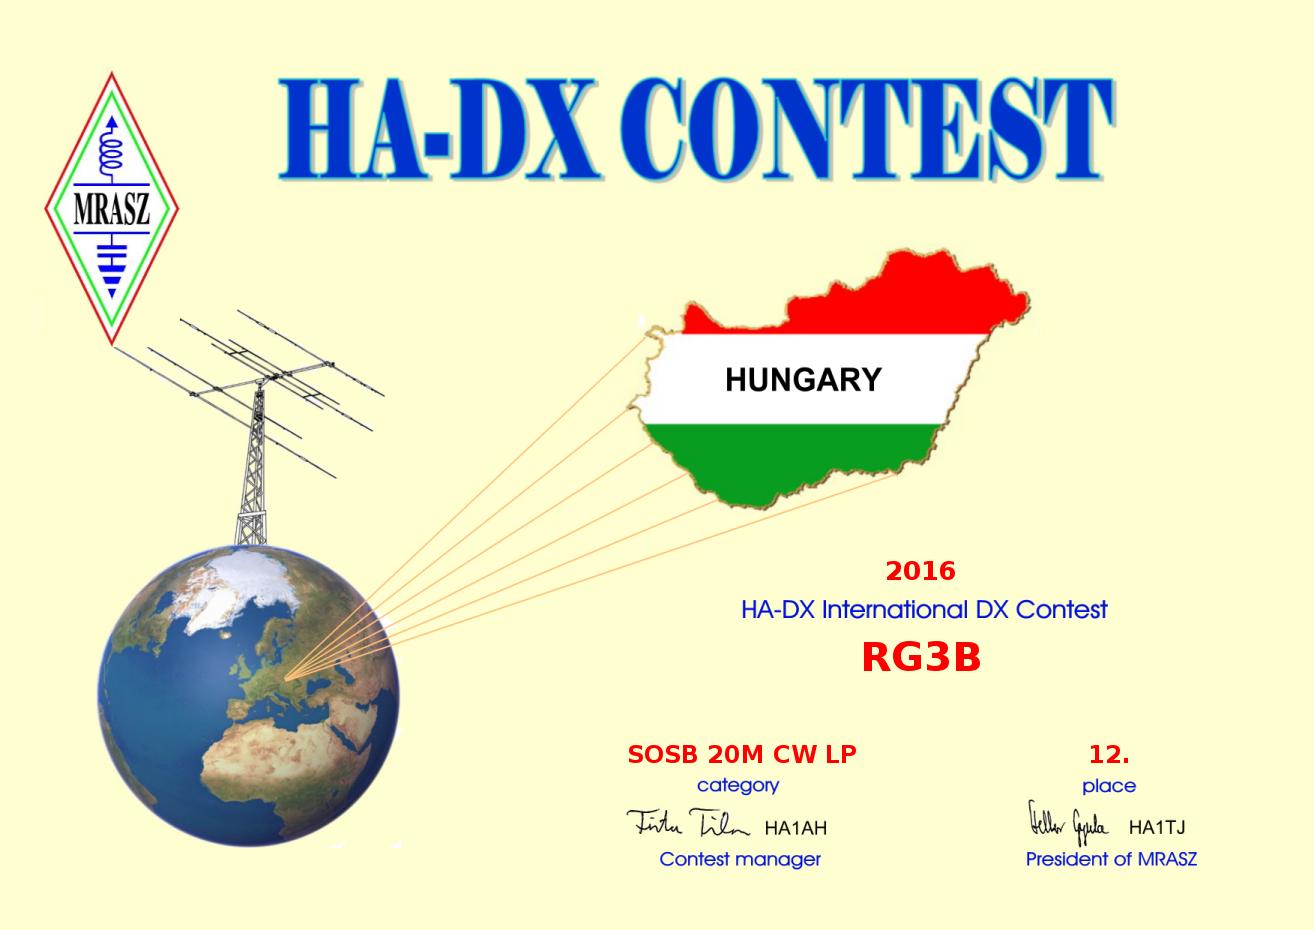 Нажмите на изображение для увеличения.  Название:RG3B HADX2016.png Просмотров:10 Размер:494.6 Кб ID:179900